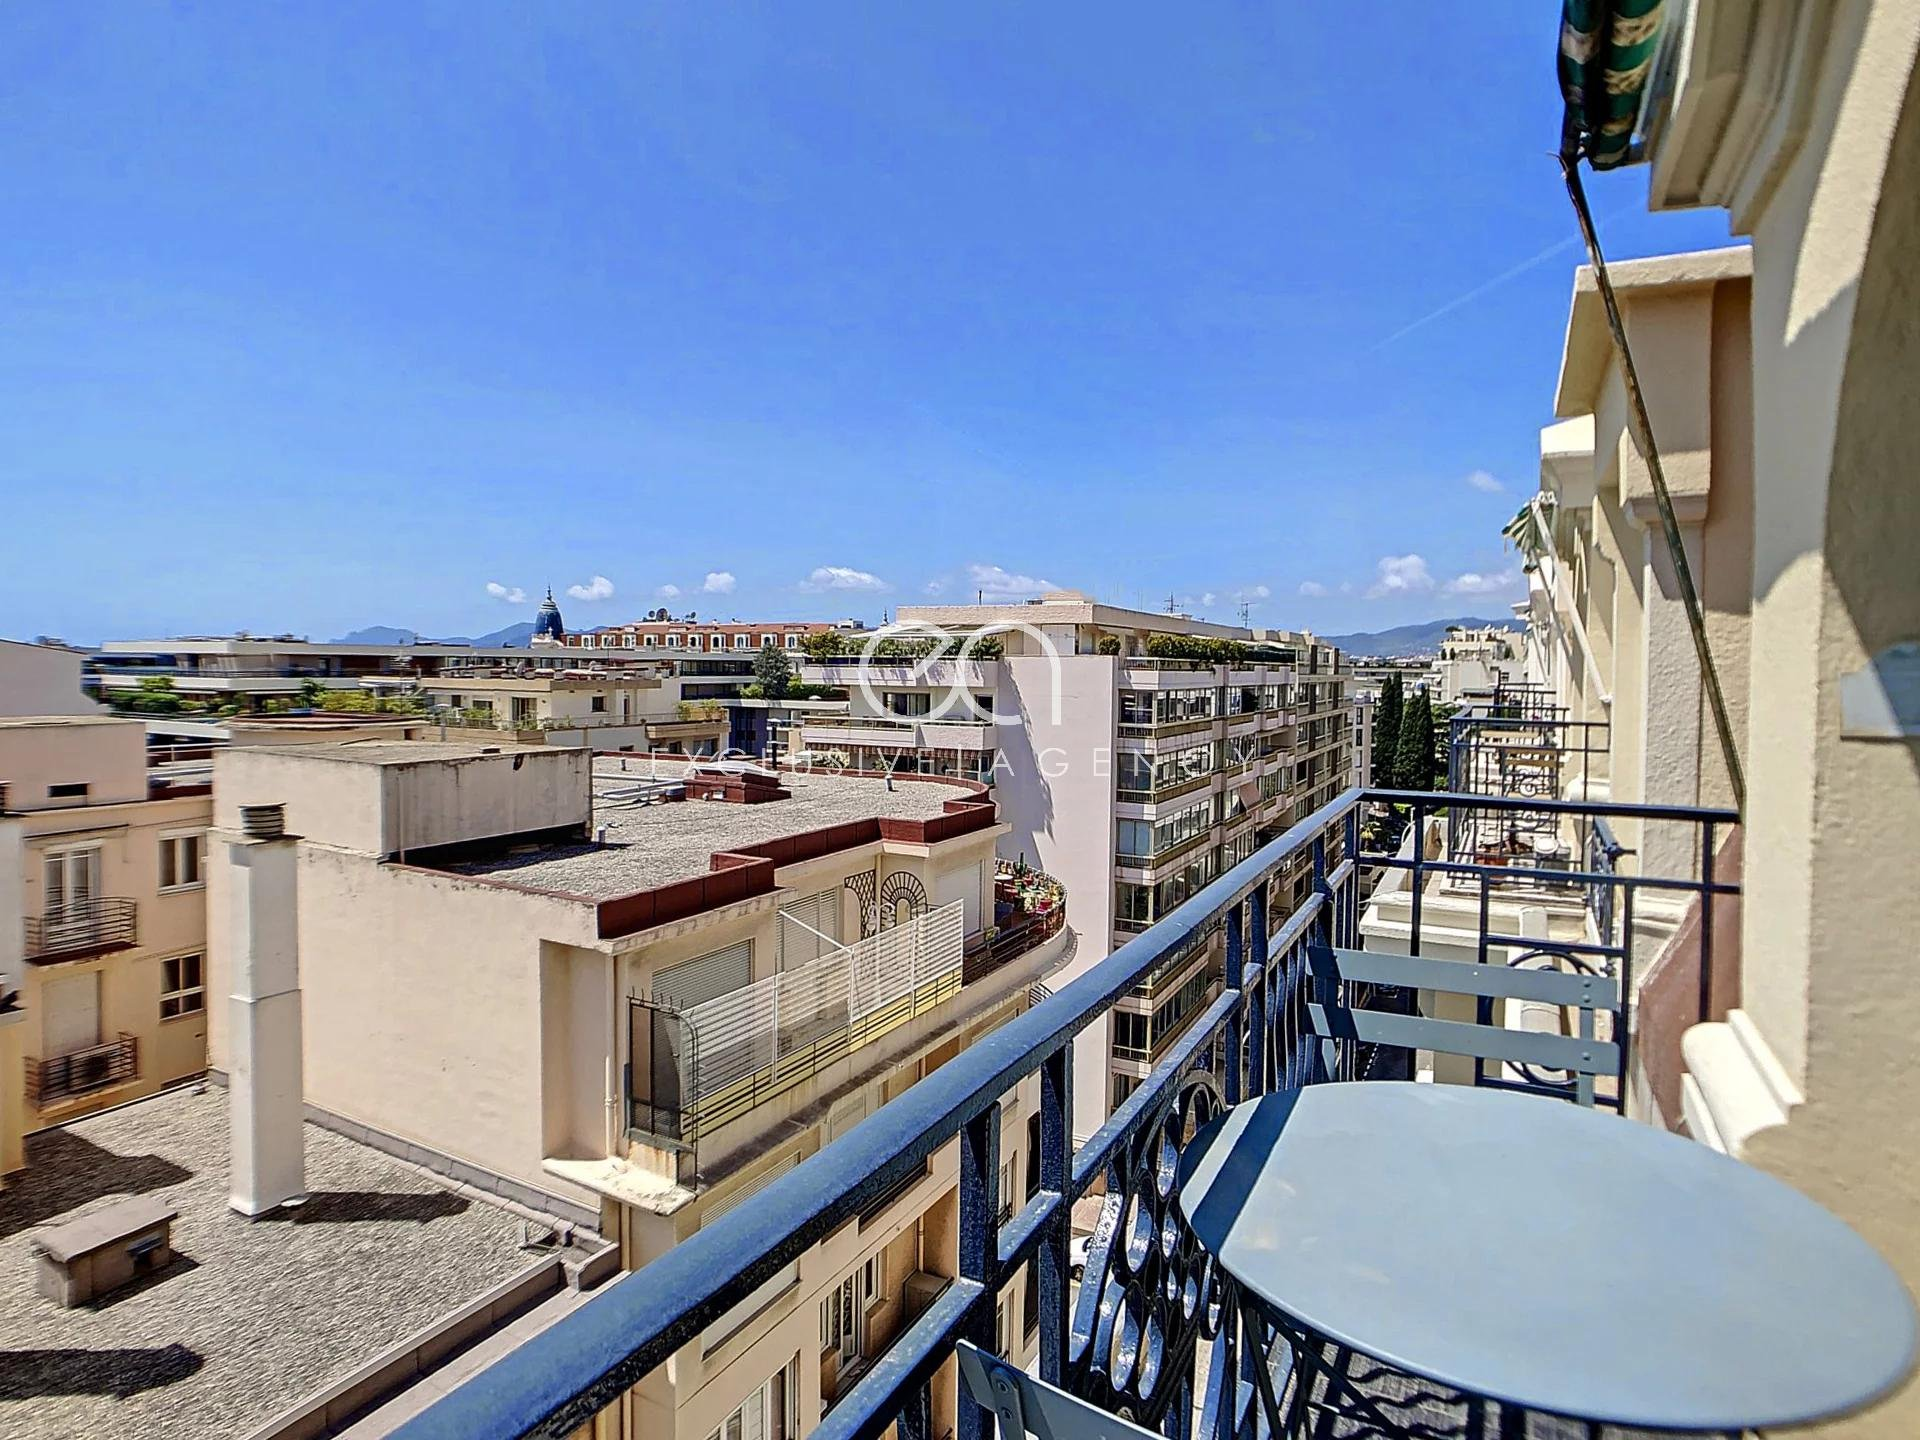 Cannes Banane (centre) 1-bedroom apartment 42sqm top floor